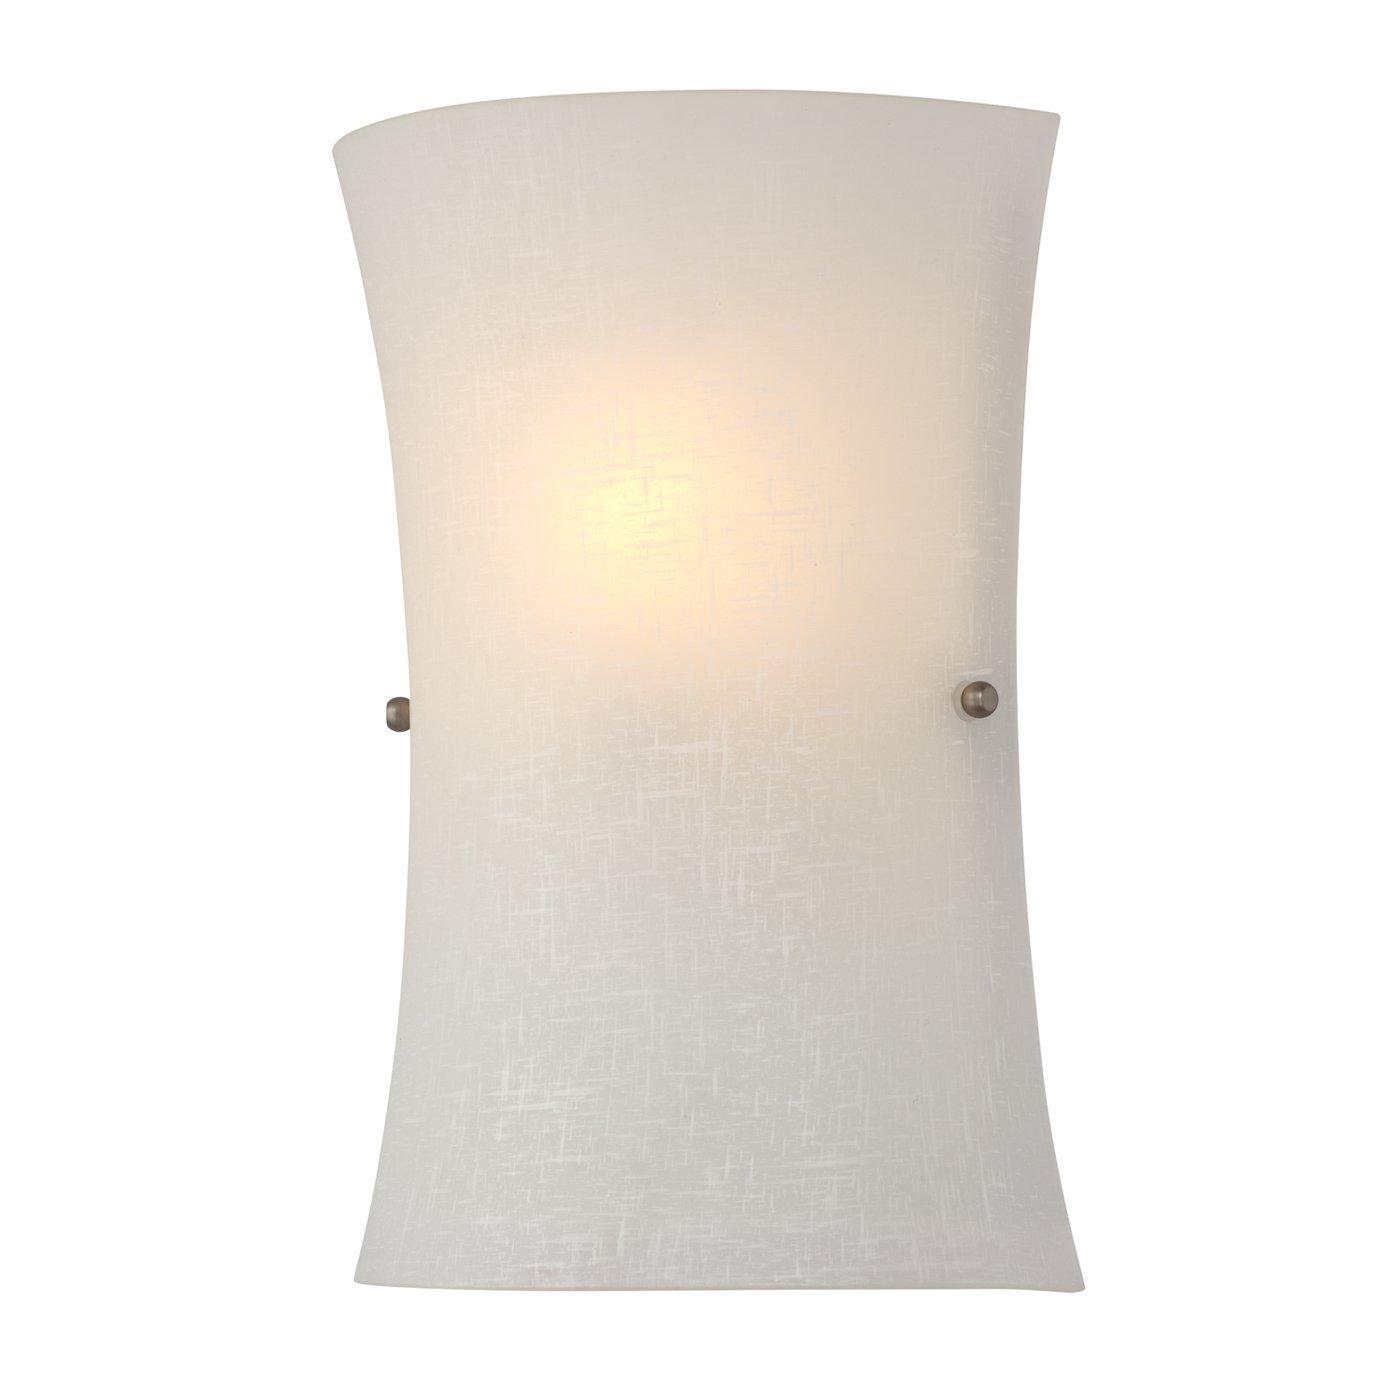 DVI DVP1242MF-WL 2 Light Kelowna Wall Sconce, Multiple Finials